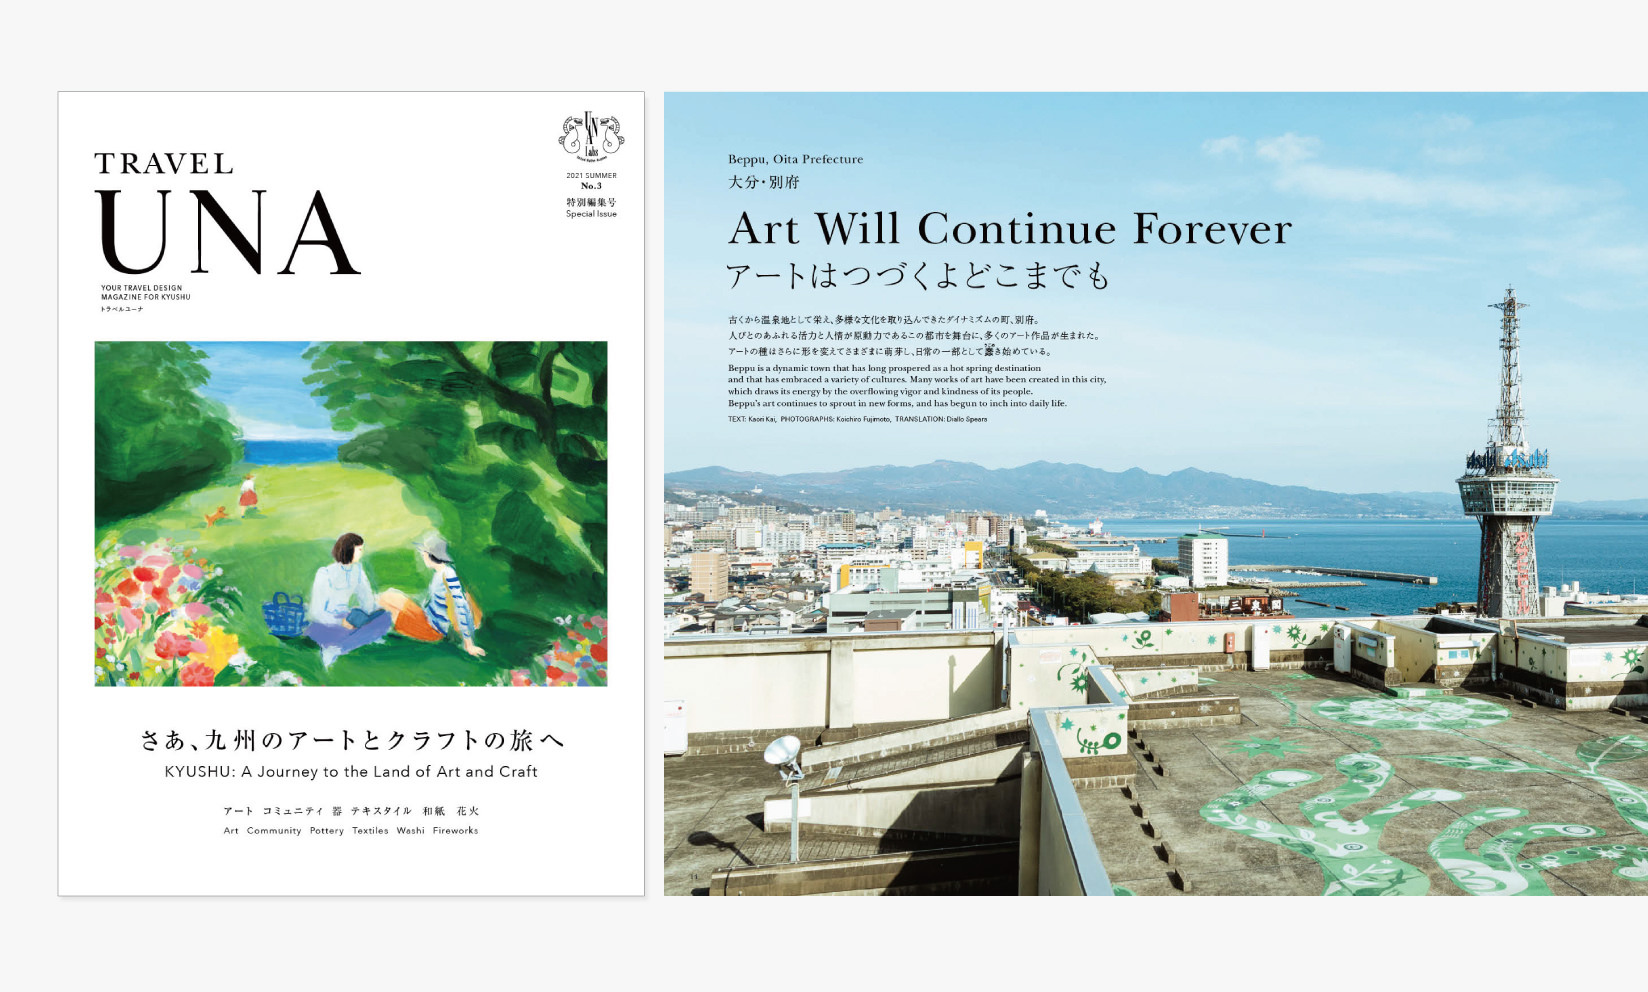 TRAVEL UNA 特別編集号 「さあ、九州のアートとクラフトの旅へ」 5/24 販売開始